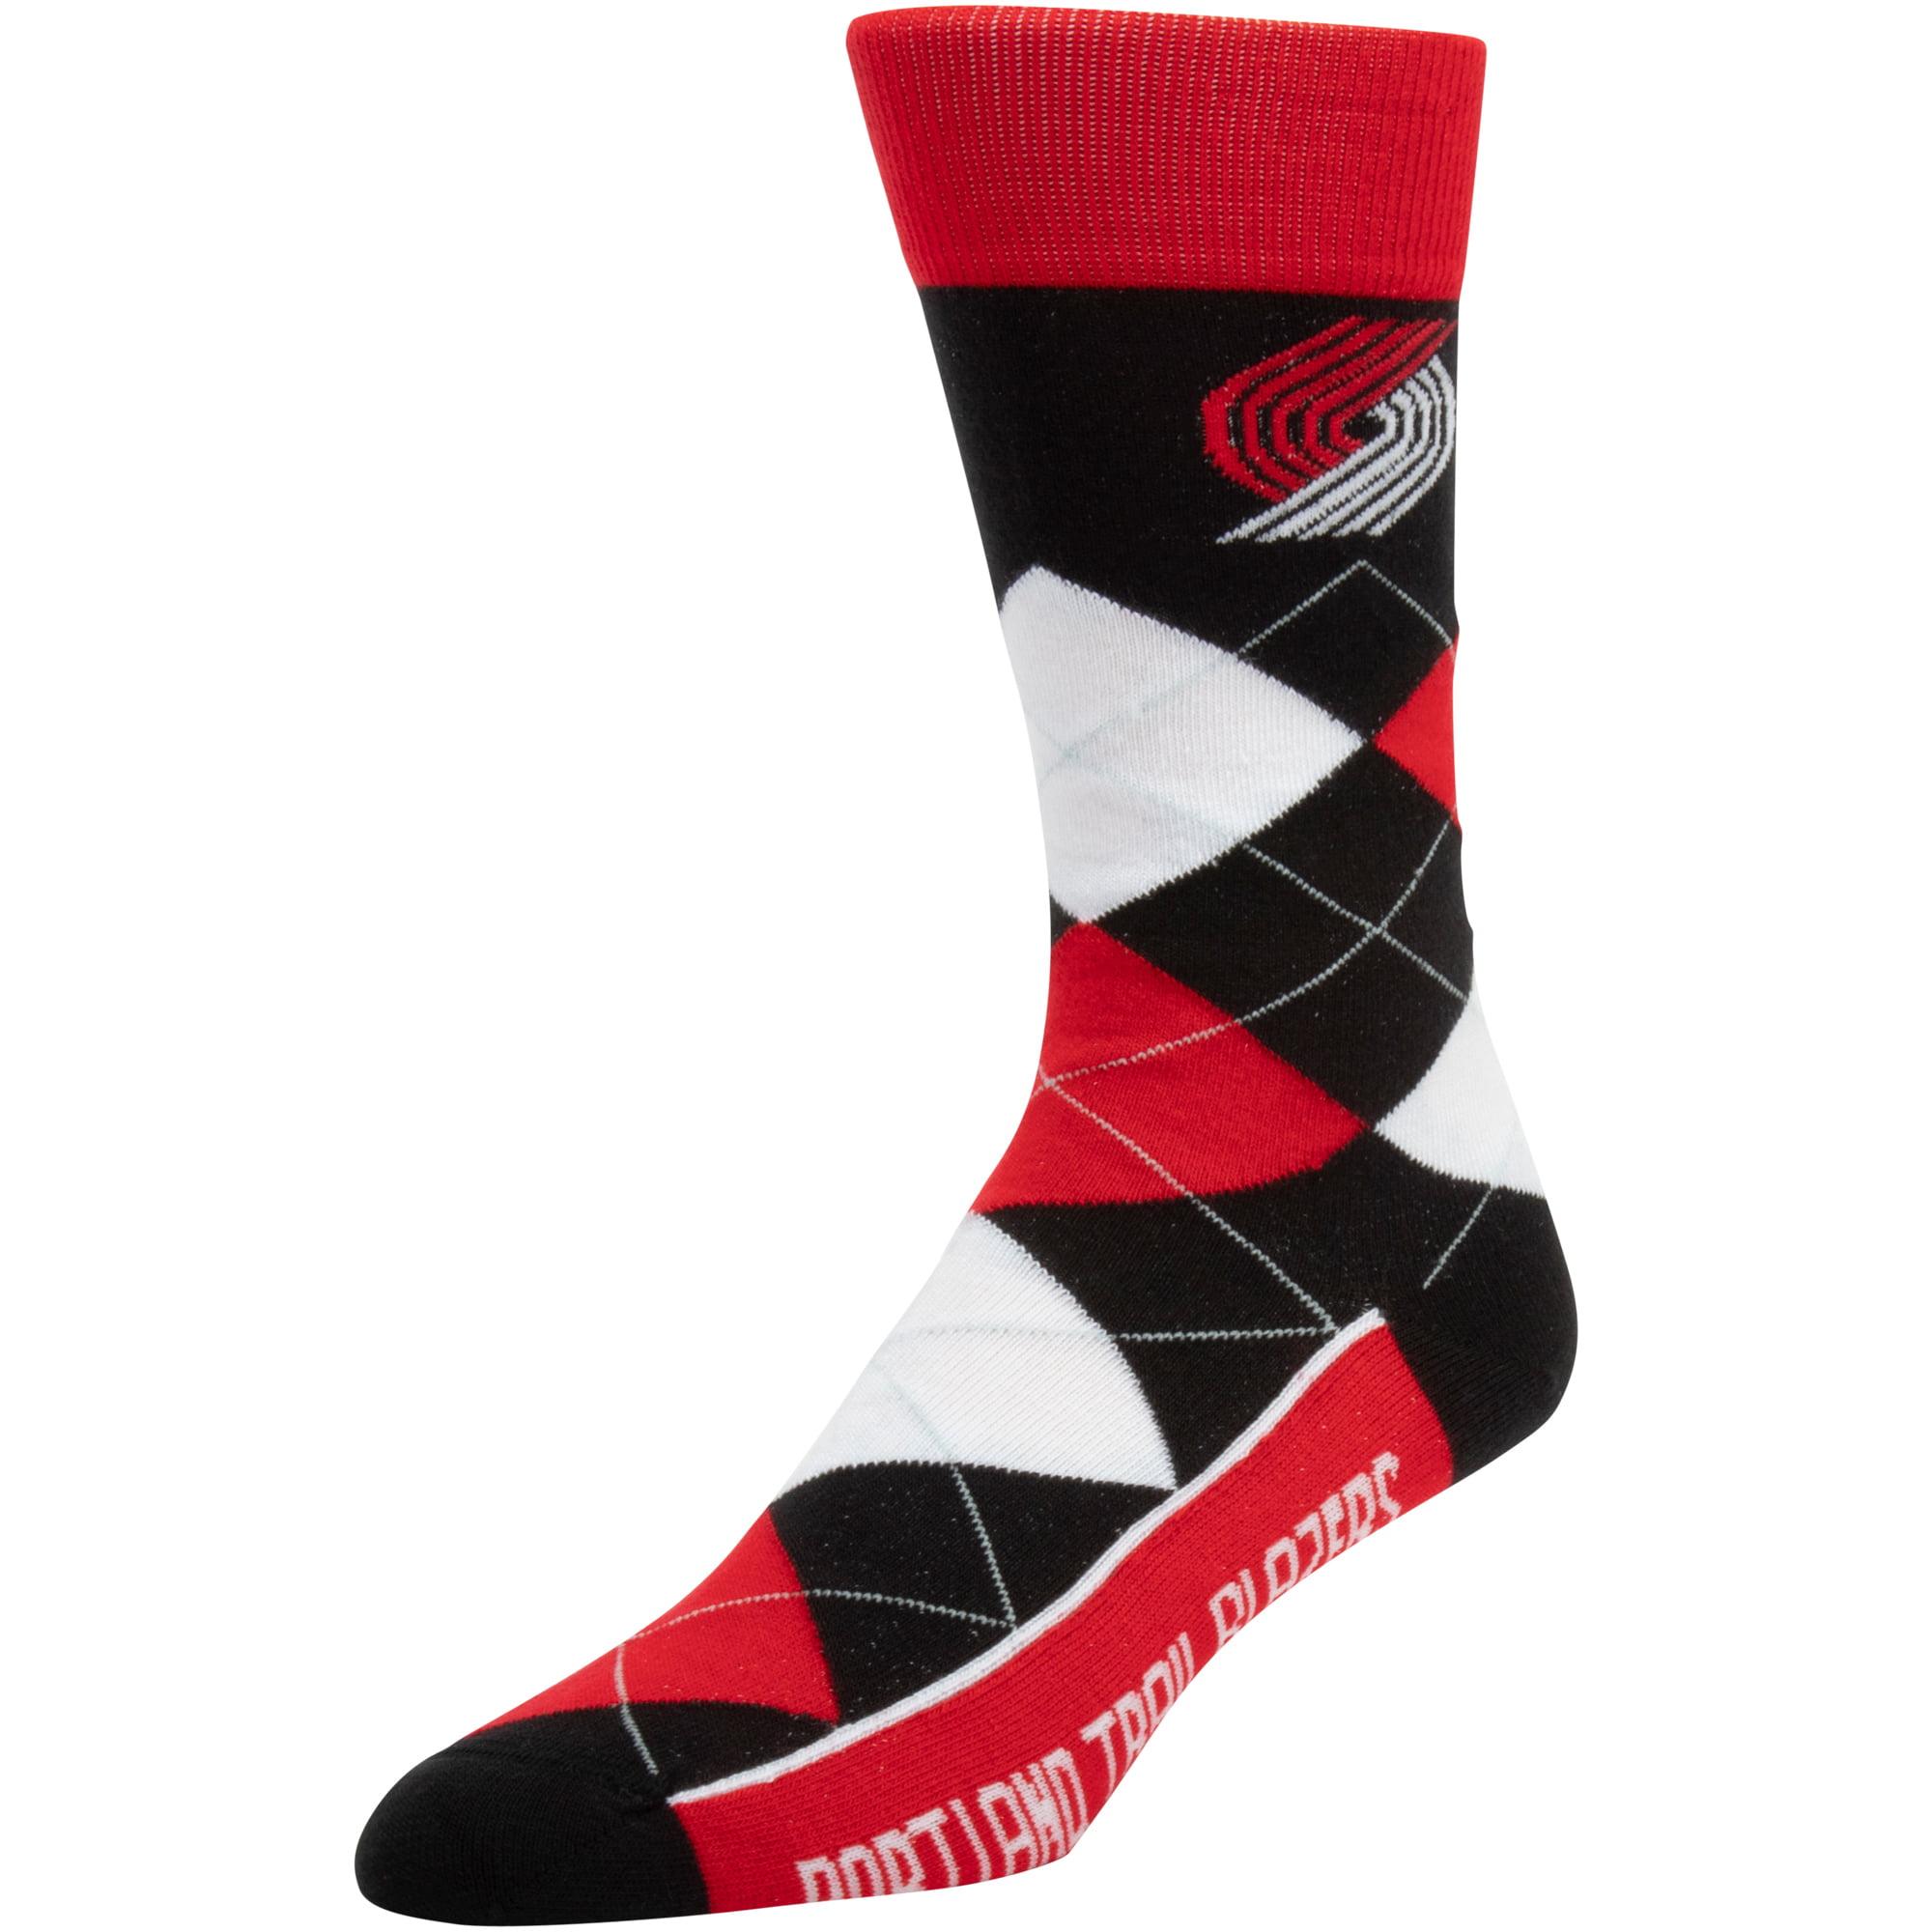 Portland Trail Blazers For Bare Feet New Argyle Socks - Red - No Size